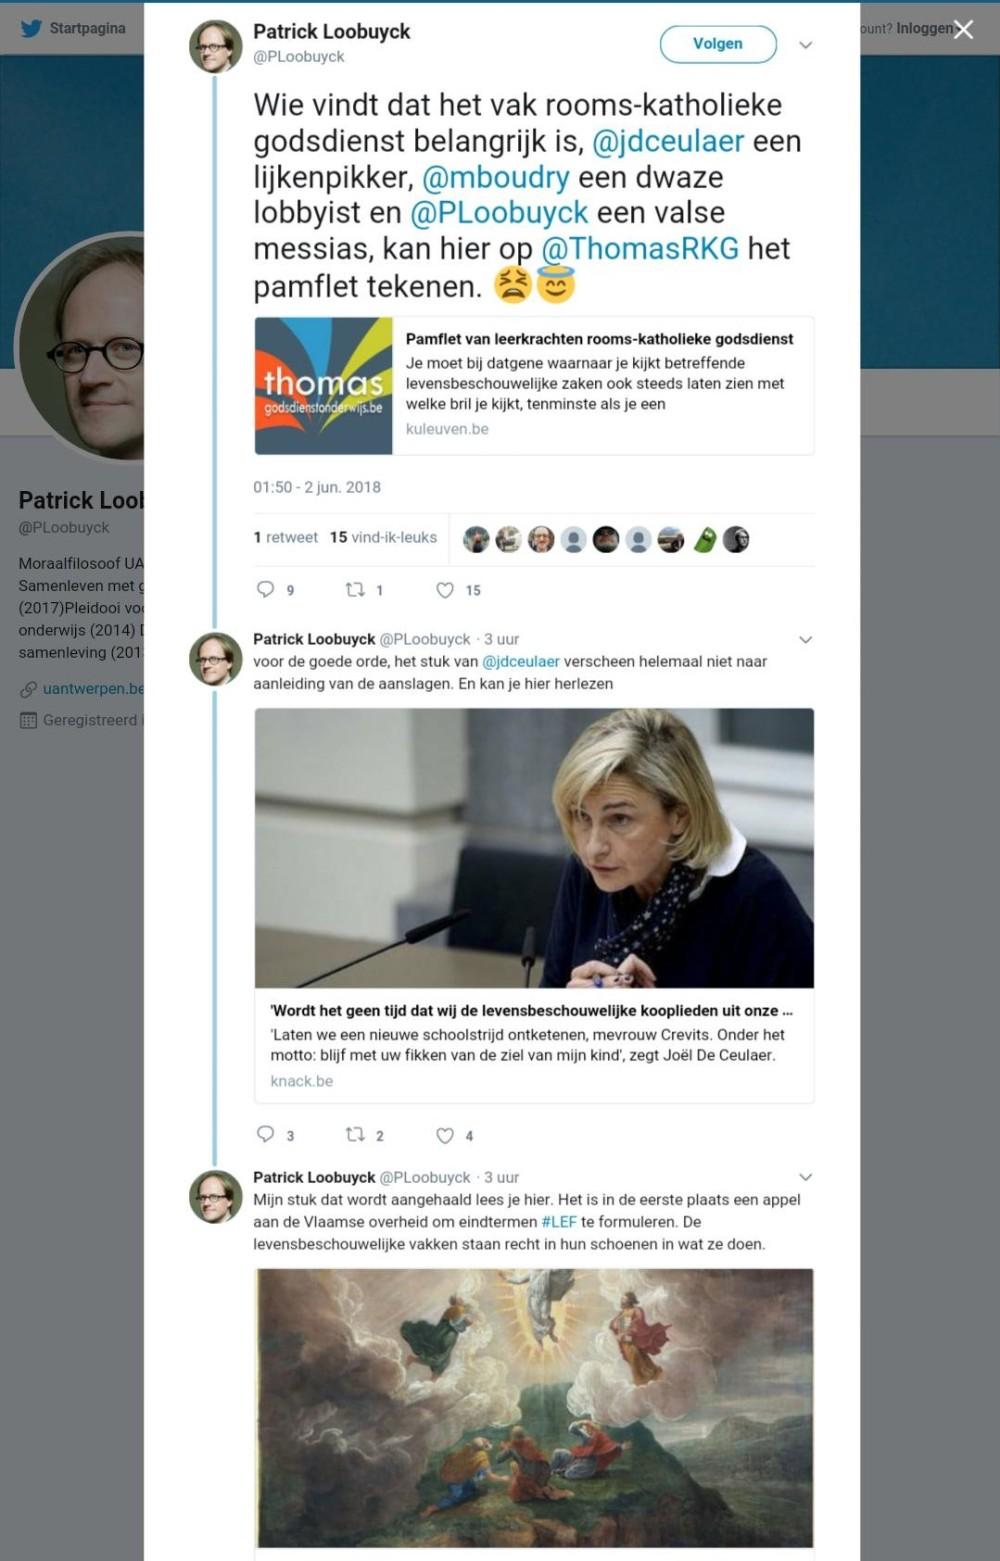 Patrick Loobuyck twitter over pamflet Godsdienst met of zonder LEF